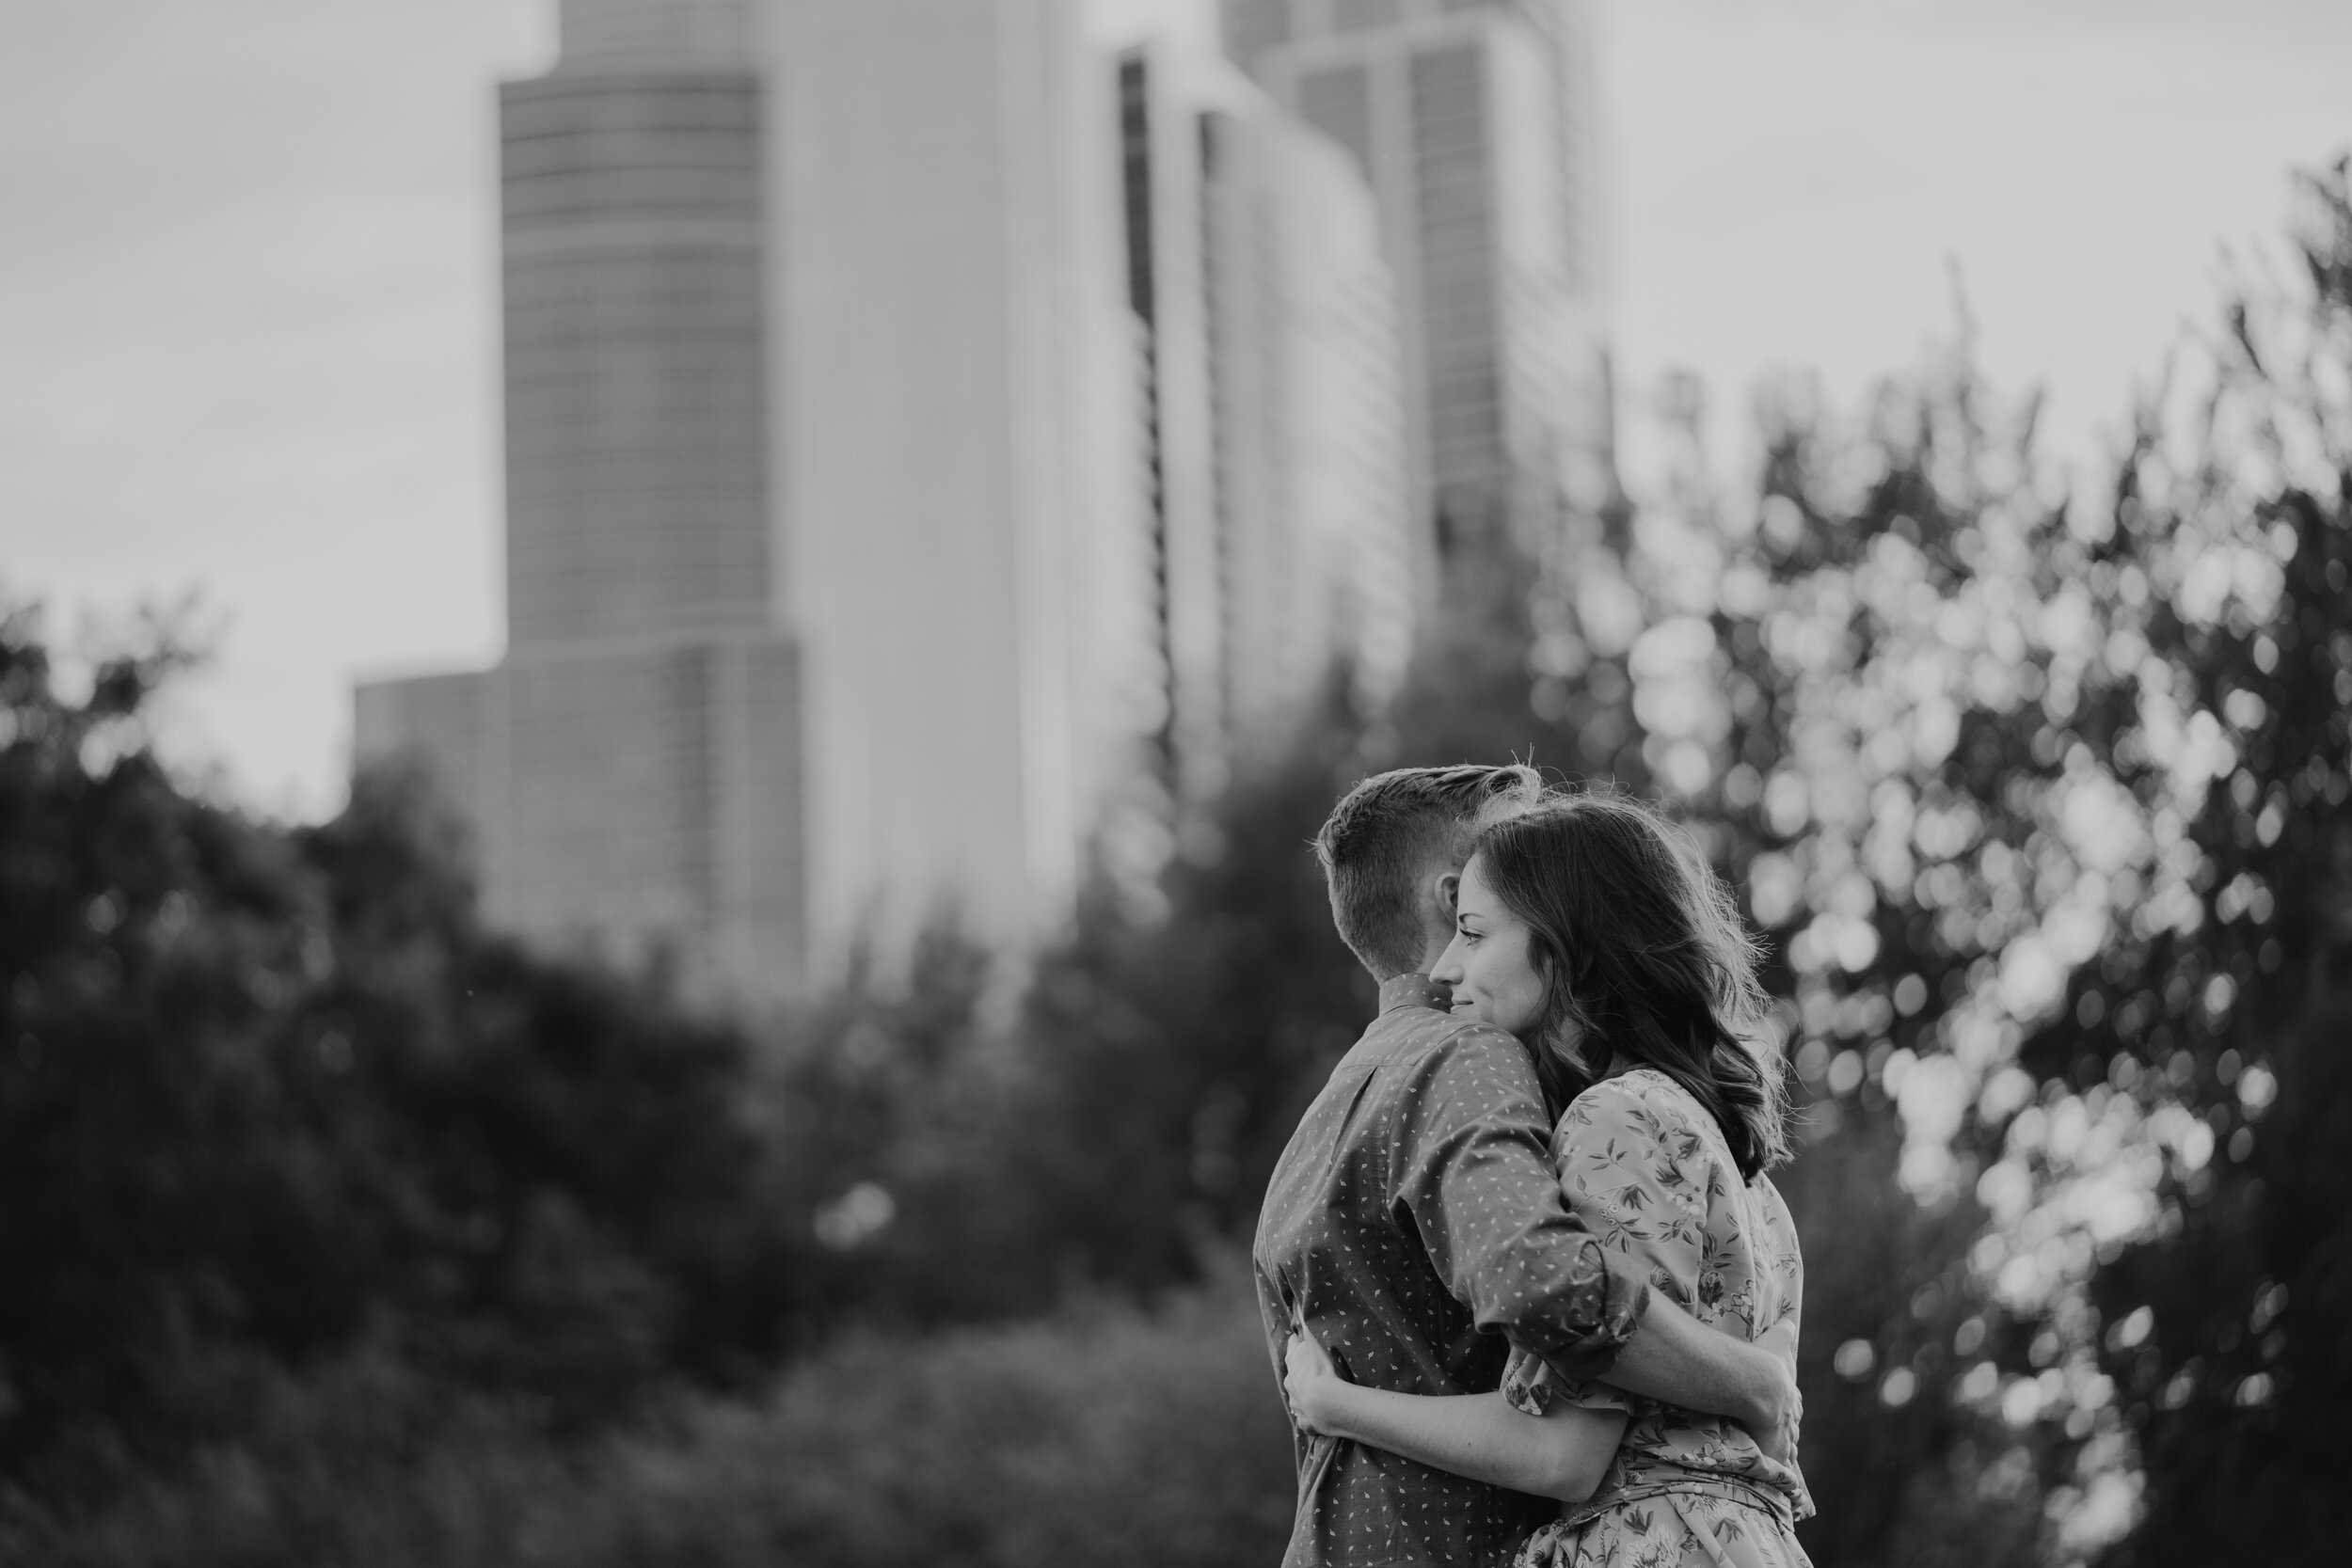 Erin & Jeff Engagement Photos - Datflipmel Photo & Films-00415-2.jpg